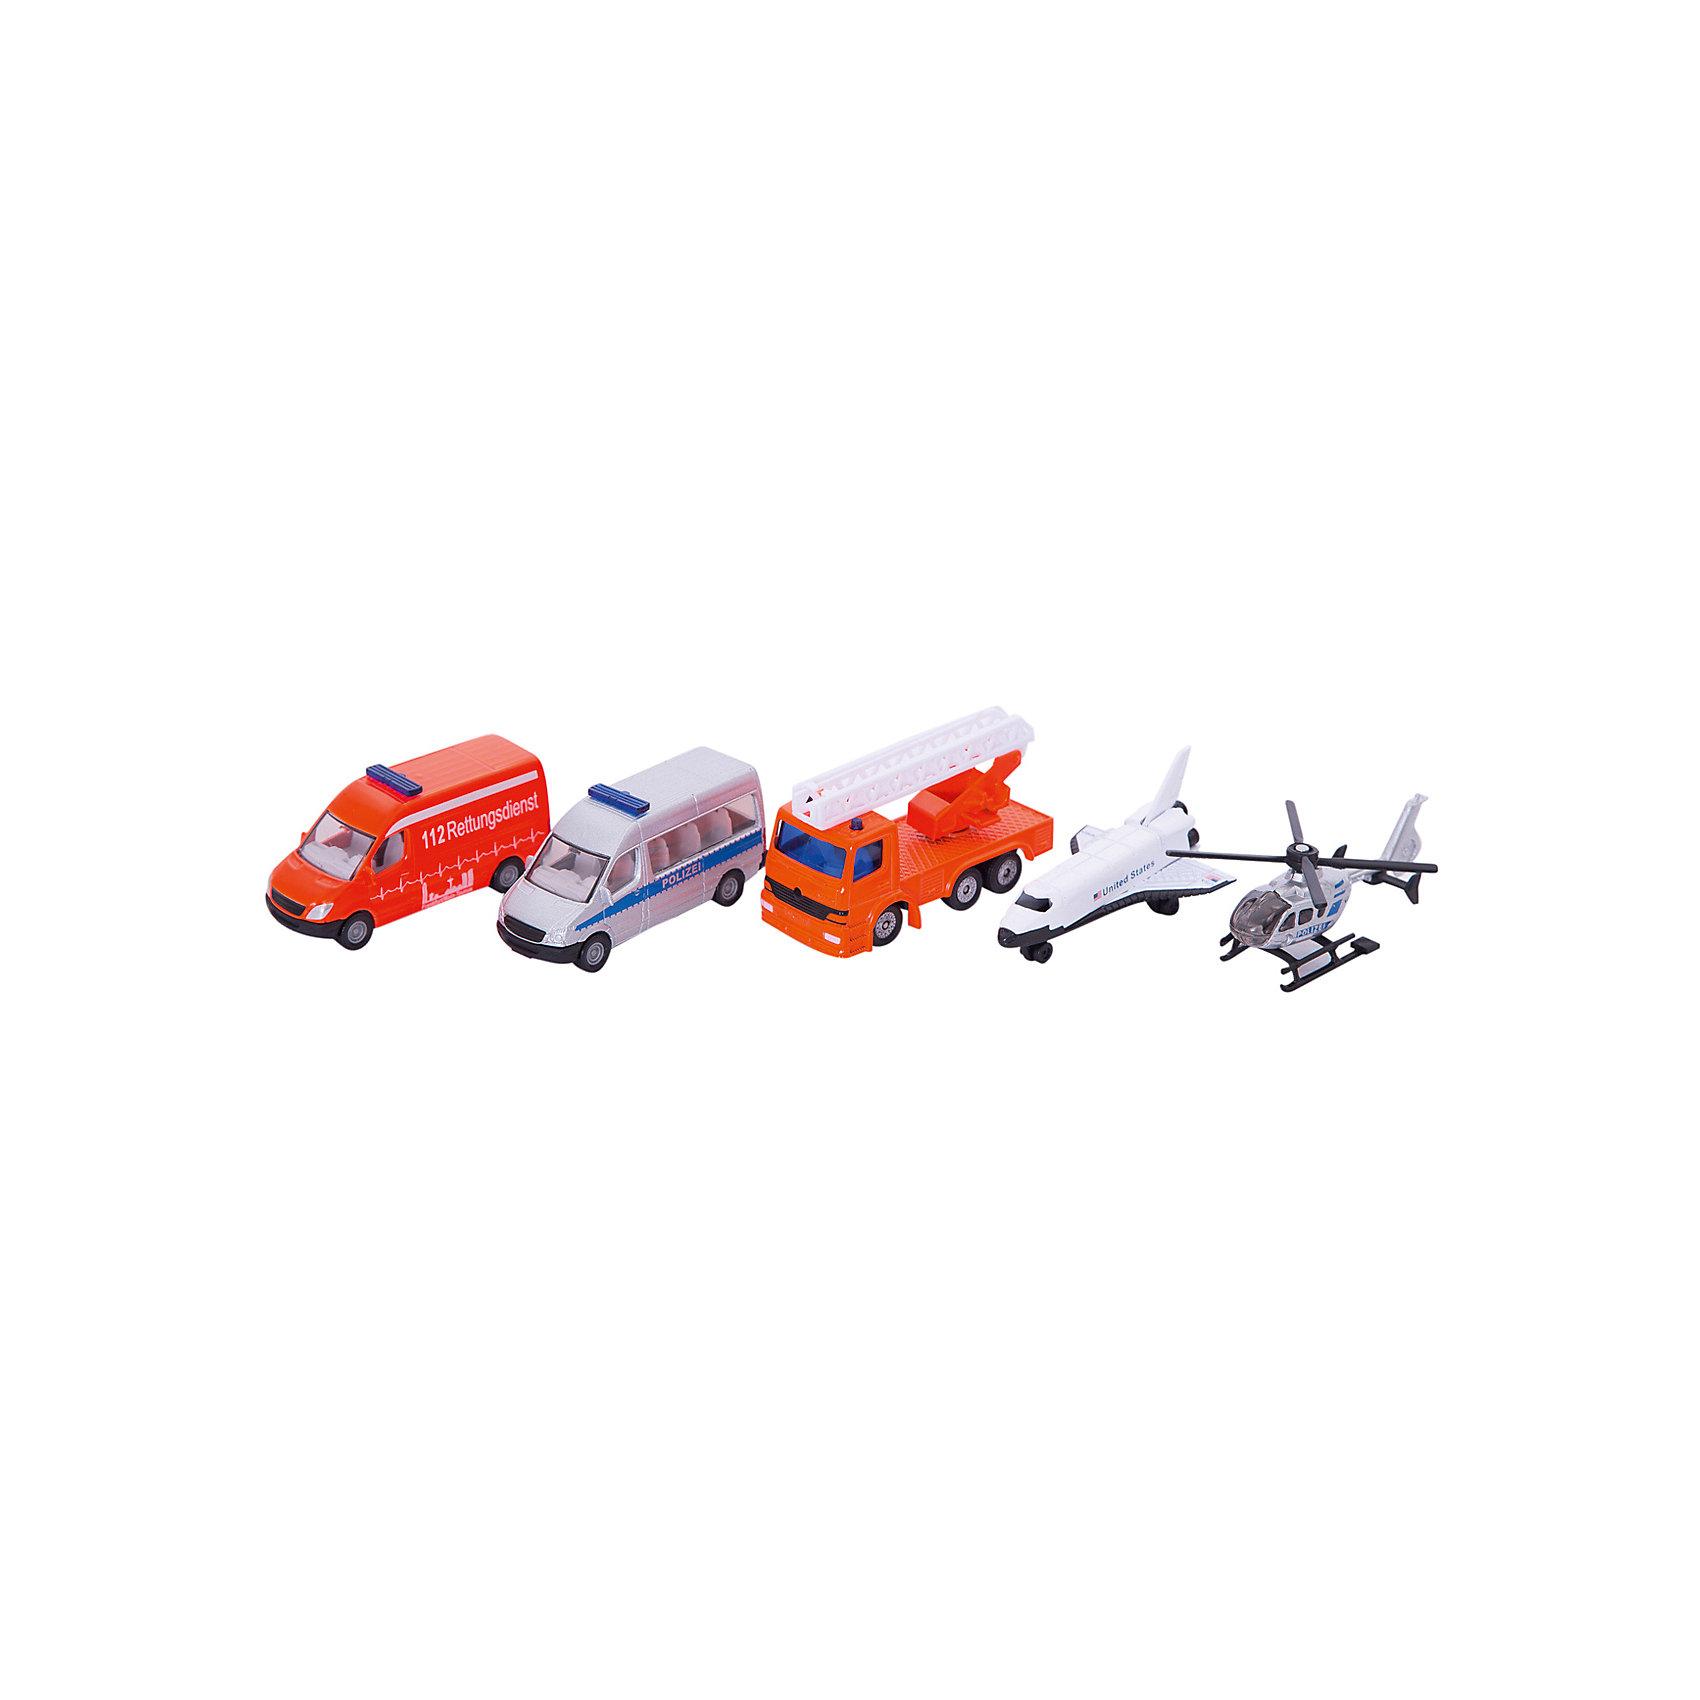 SIKU SIKU 6282 Набор Вертолет, самолет, 2-х микроавт.и кран машинки siku городской автобус